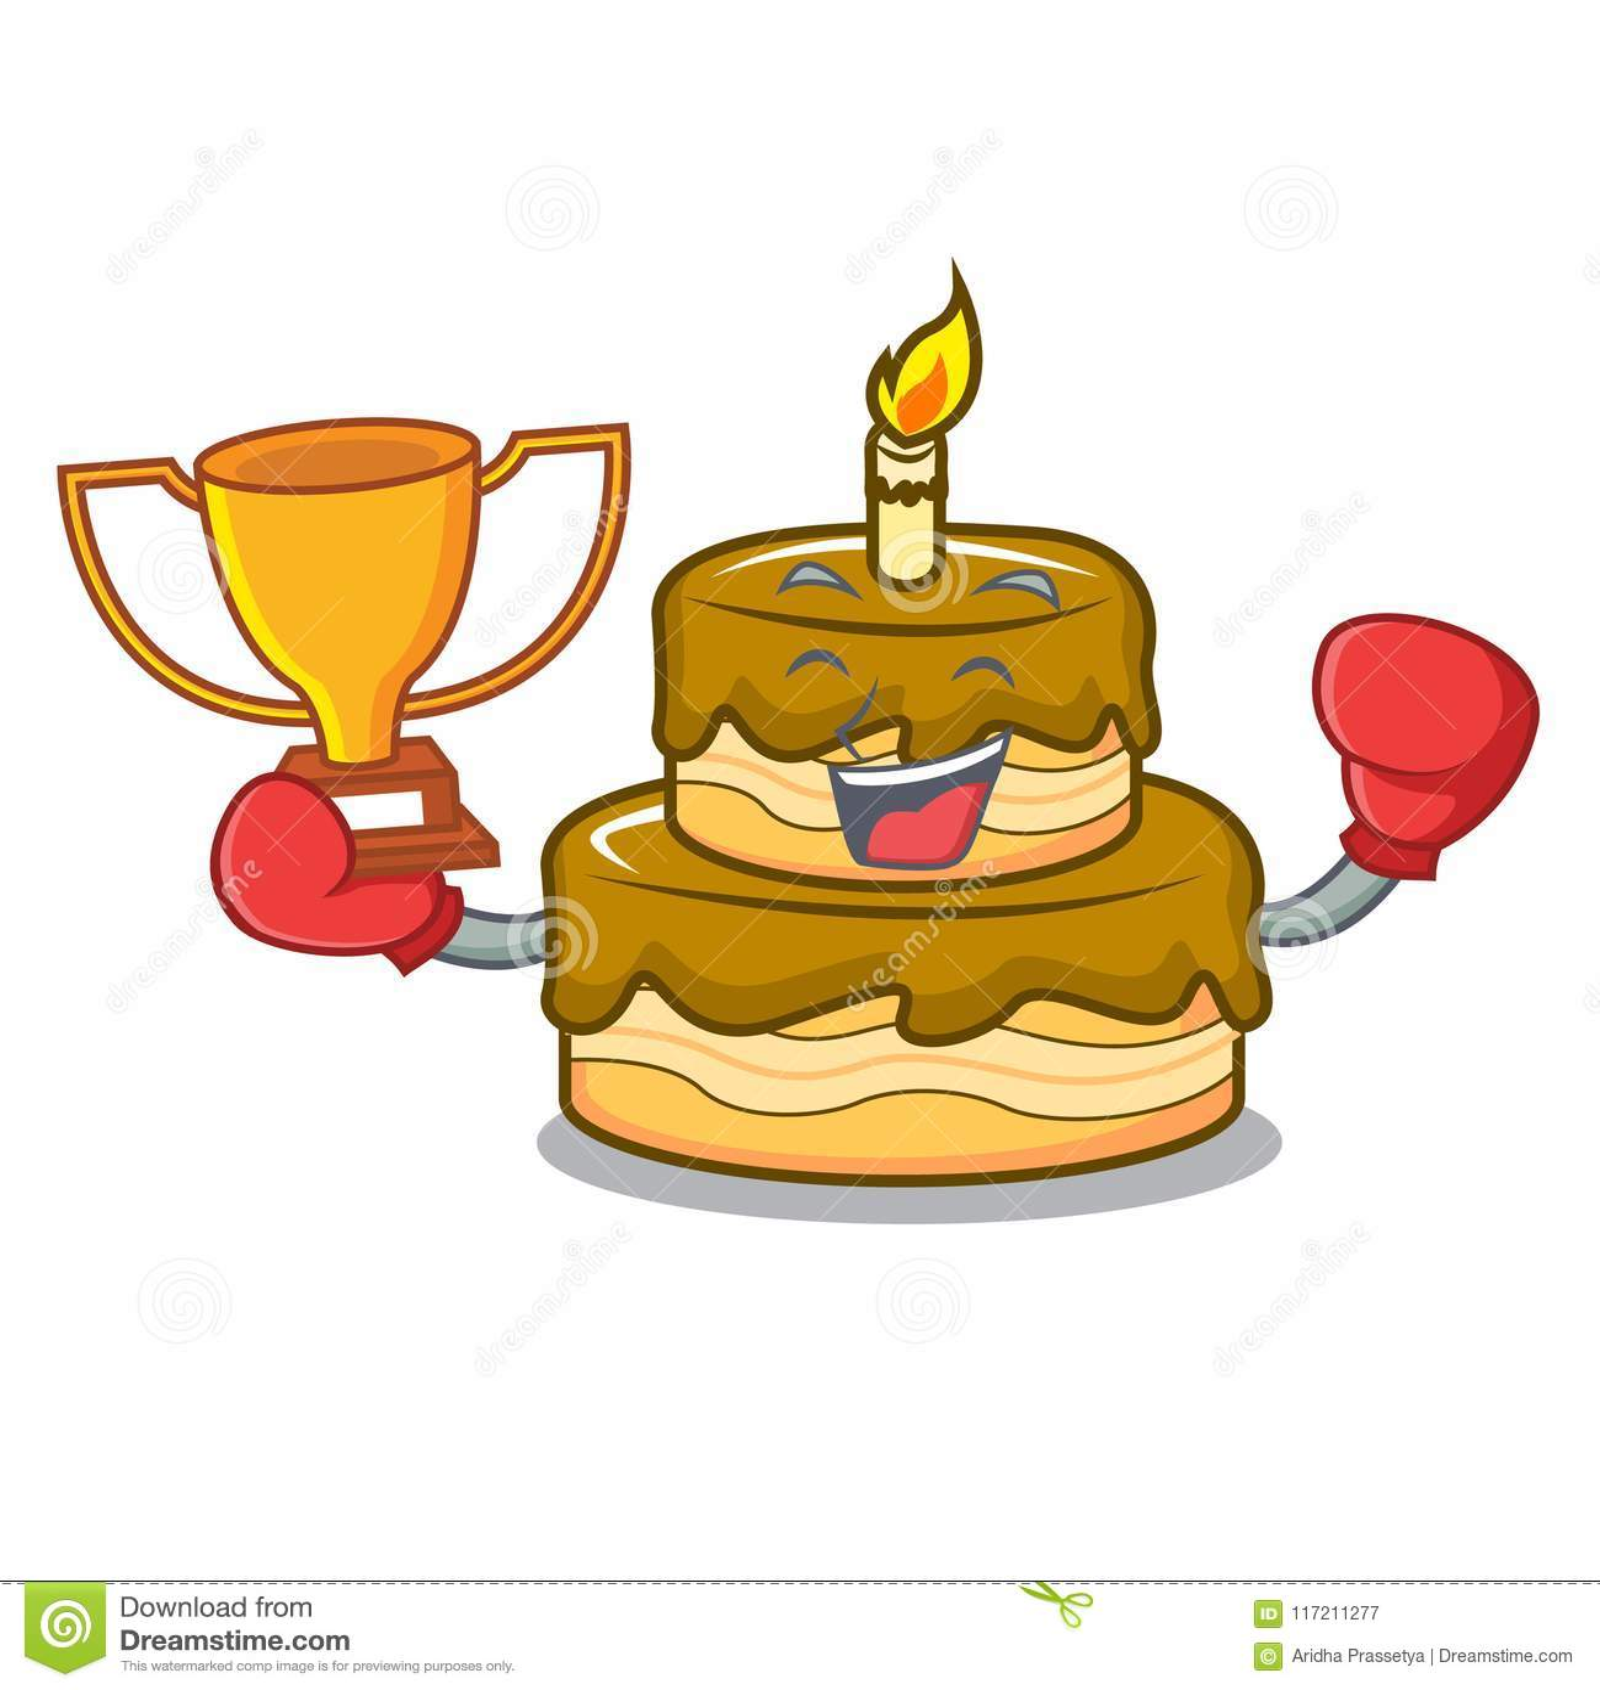 Strange Boxing Winner Birthday Cake Mascot Cartoon Stock Vector Funny Birthday Cards Online Alyptdamsfinfo